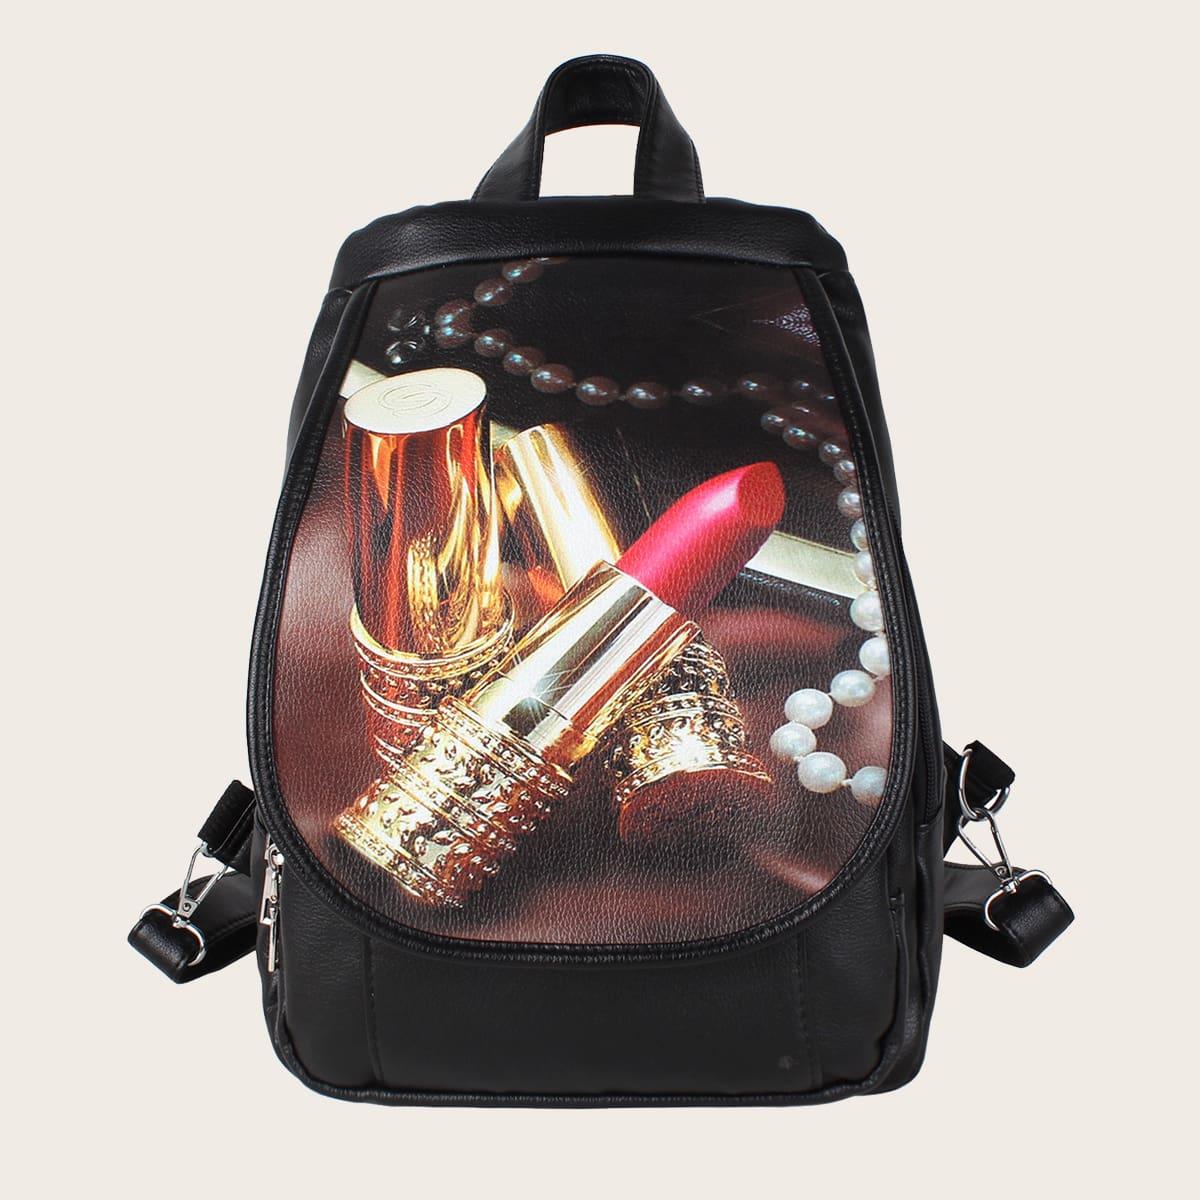 Lipstick Print Flap Backpack